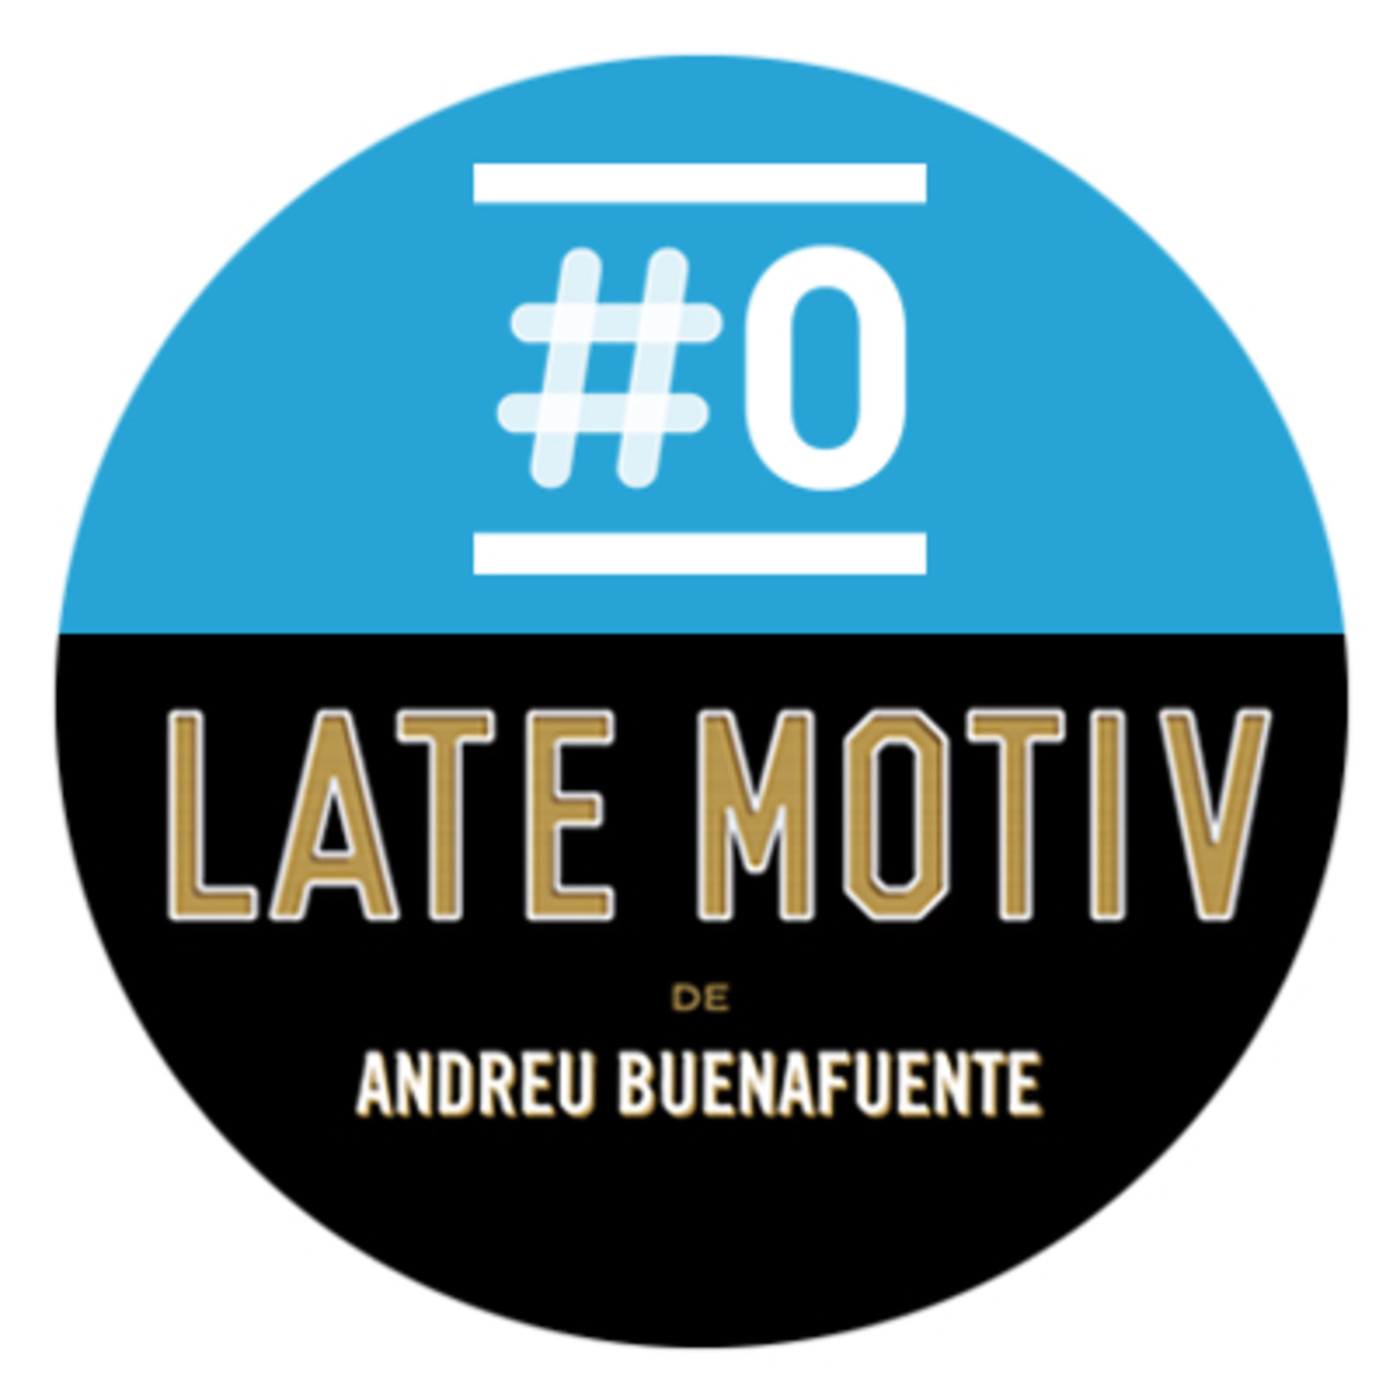 LATE MOTIV 573 - Programa completo